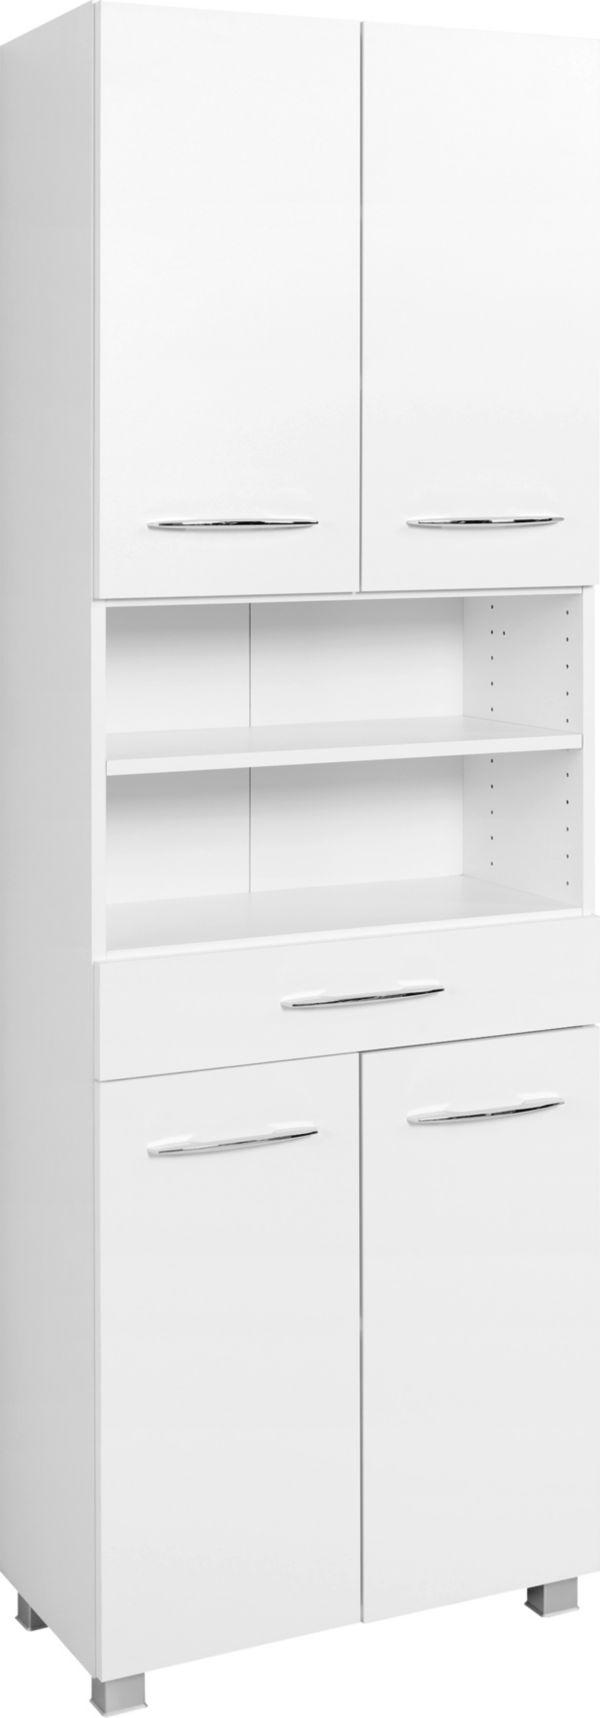 held m bel seitenschrank portofino badschrank. Black Bedroom Furniture Sets. Home Design Ideas